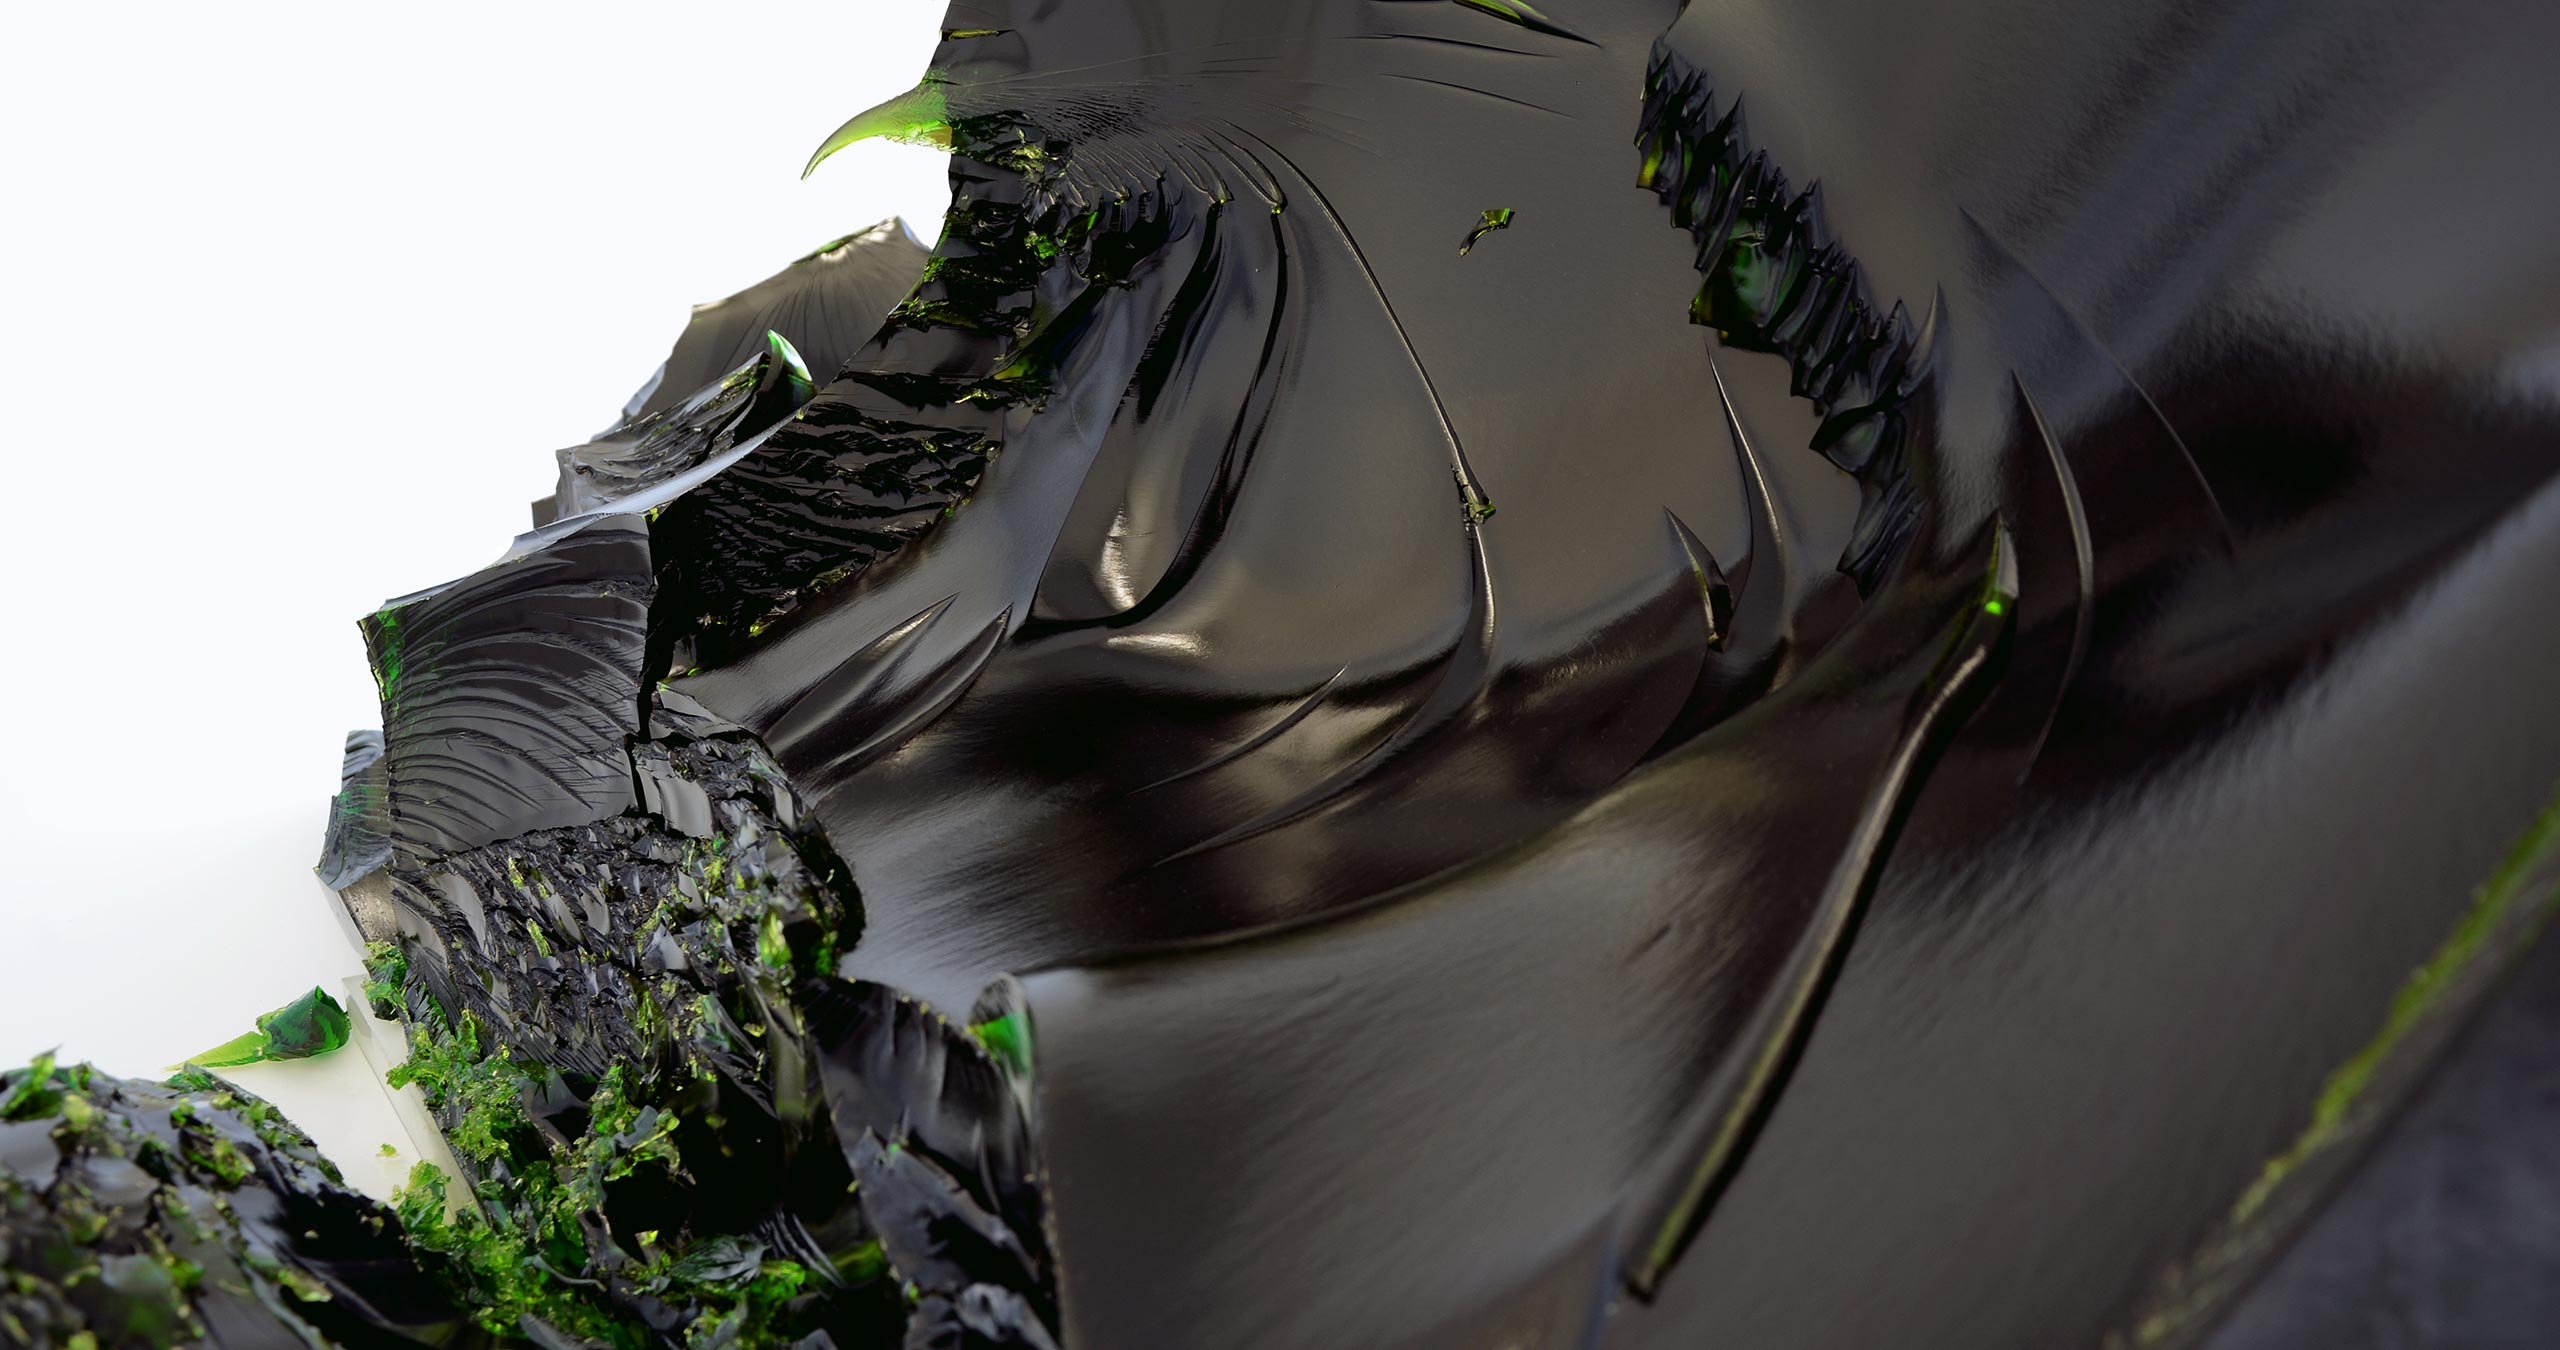 elisabeth-windisch-ambrosia-officially-amazing-001